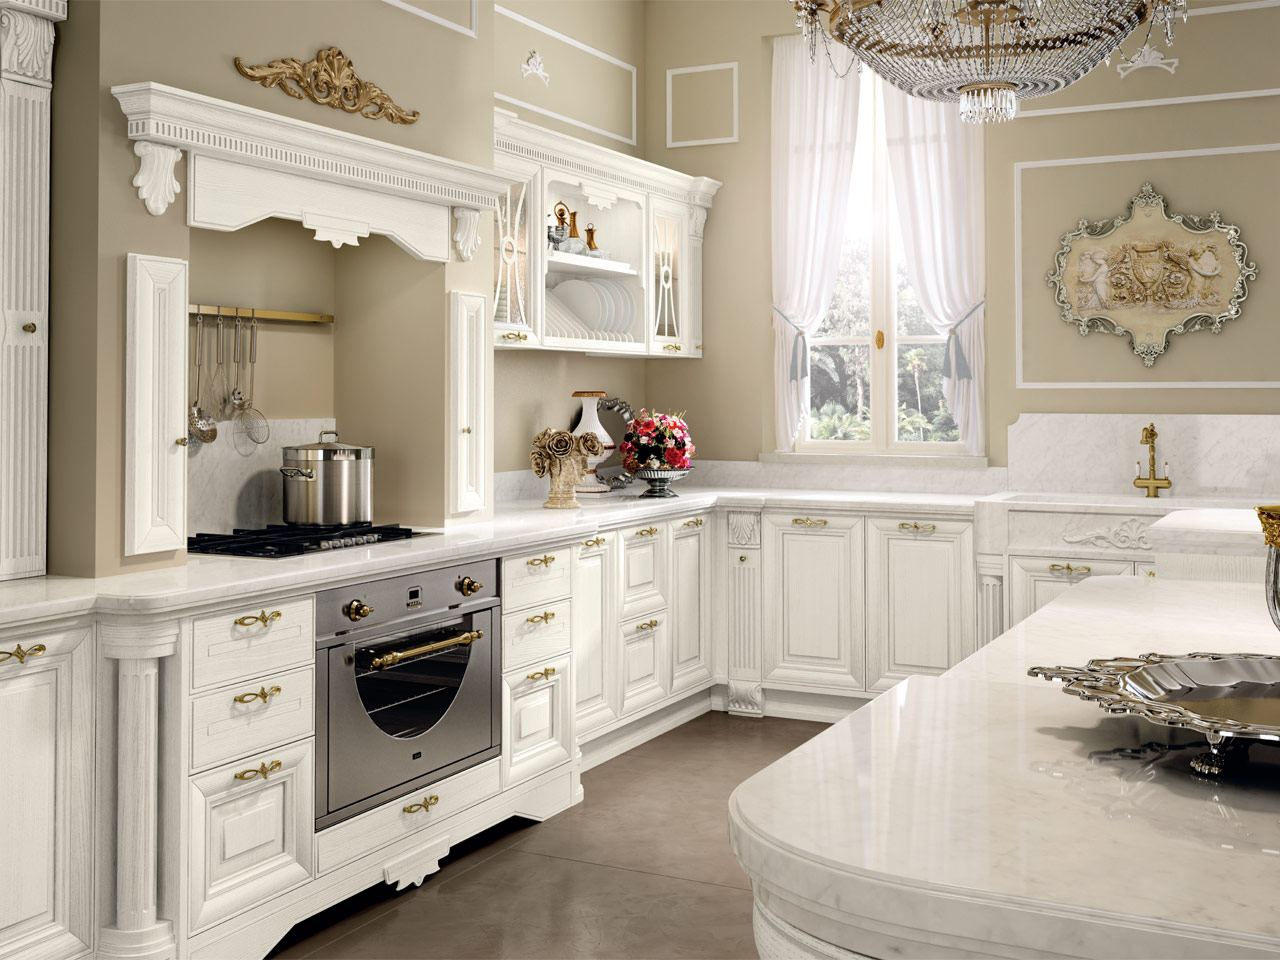 Pantheon küche by cucine lube